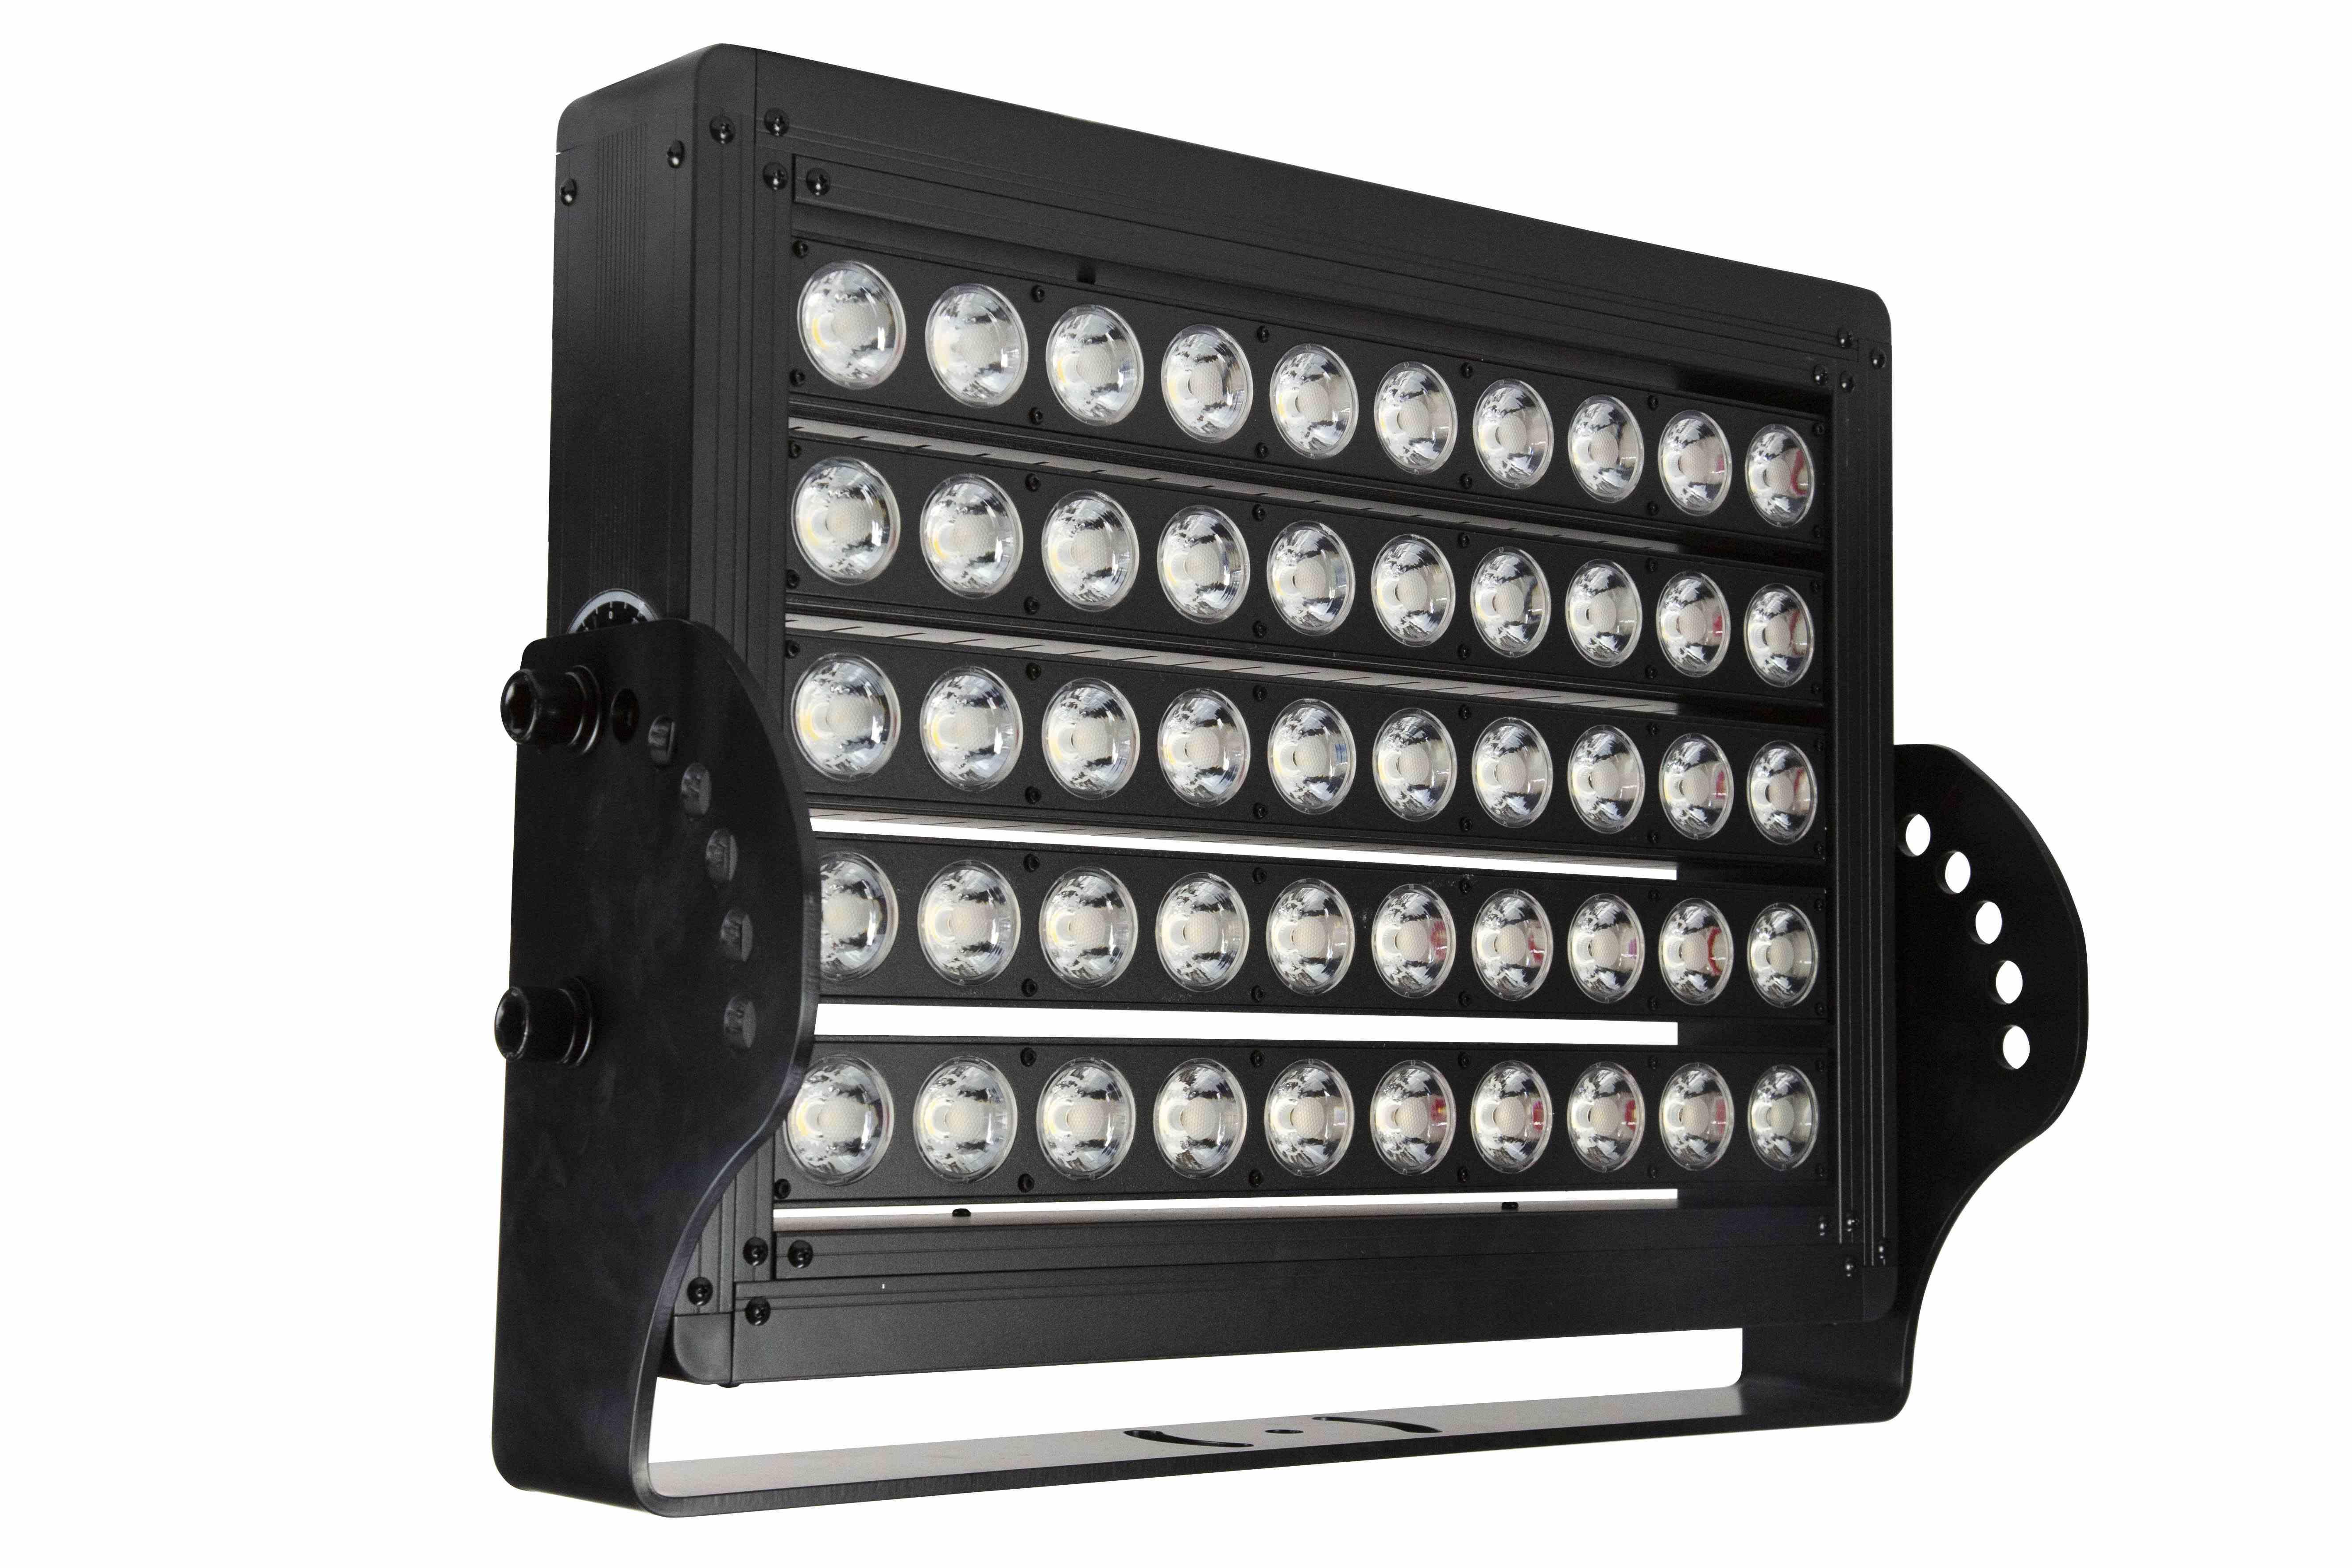 480 watt high bay led light 60000 lumens 480v ac stainless gau hb 400w led ss 480v hi res image 01 arubaitofo Gallery